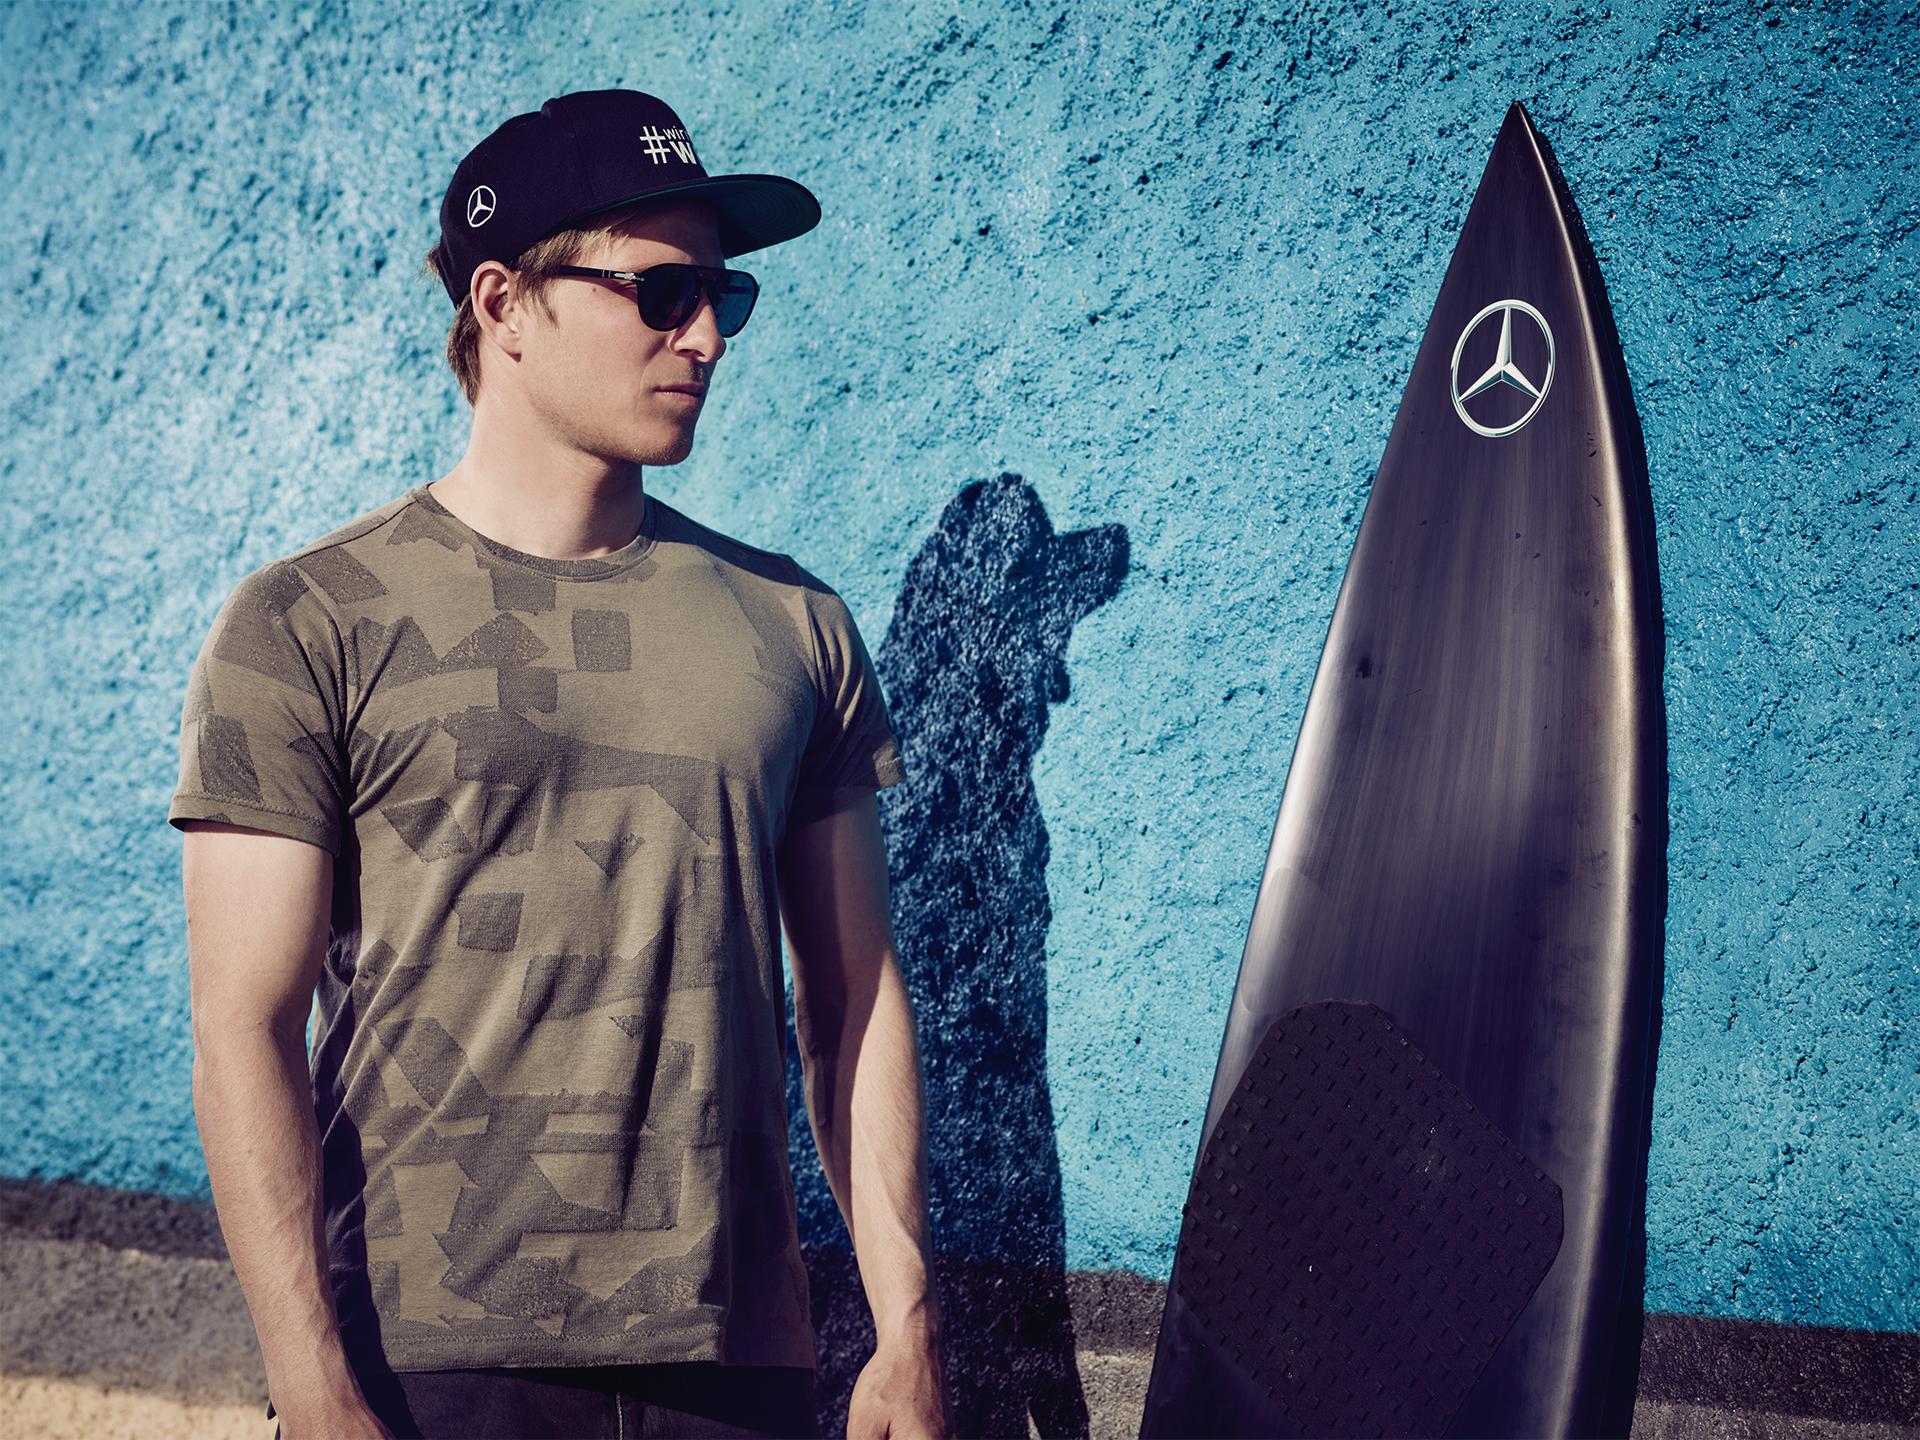 sebastian steudtner, surf, sports, portrait, nazare, portugal, mercedes benz